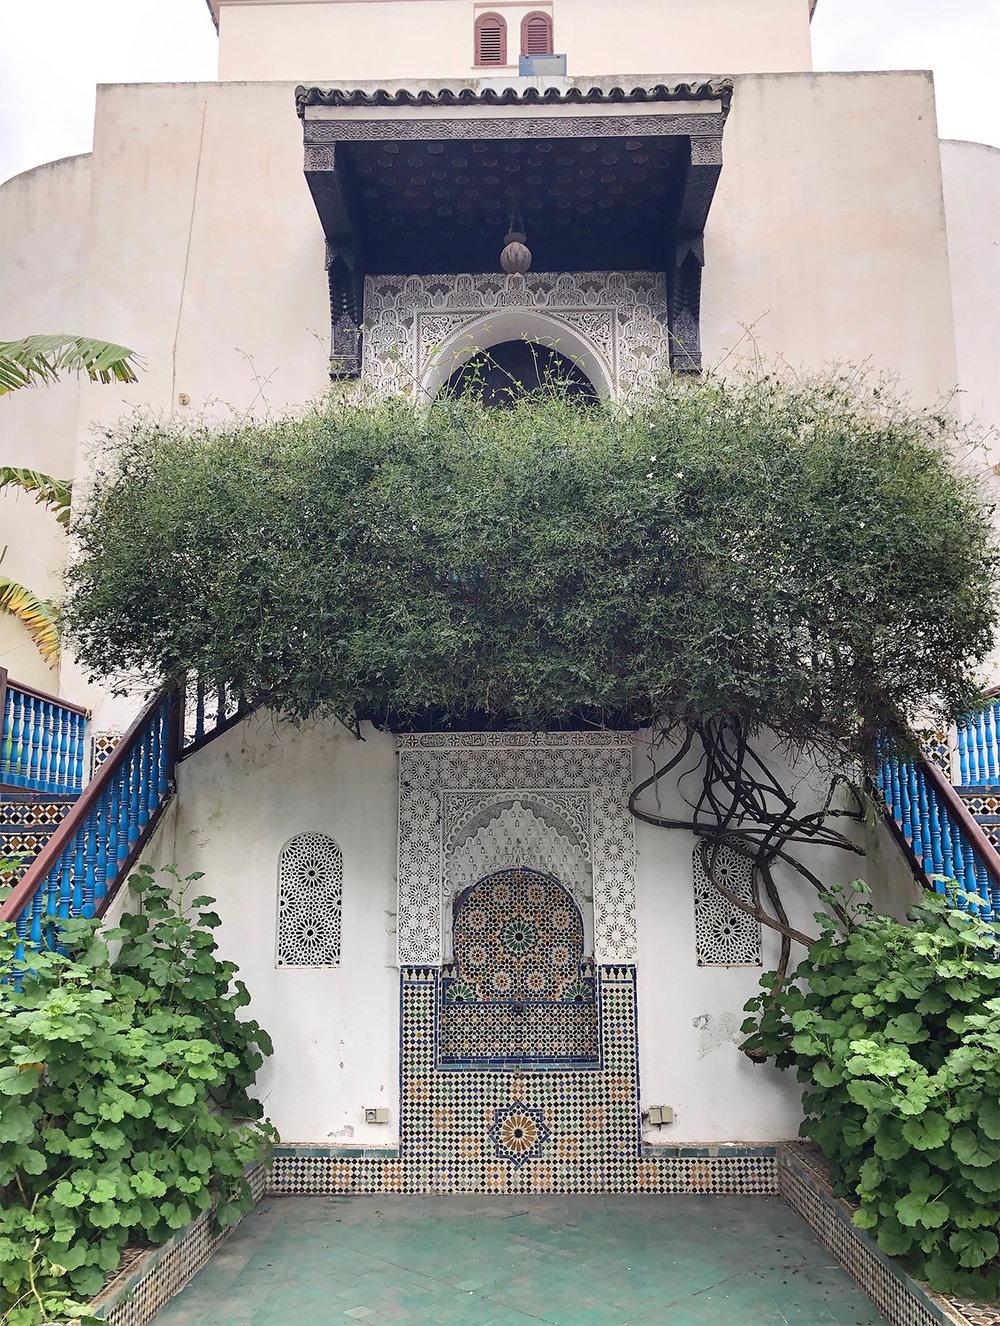 A beautiful tiled fountain in the courtyard of the Royal Artisan School in Tetouan, Morocco